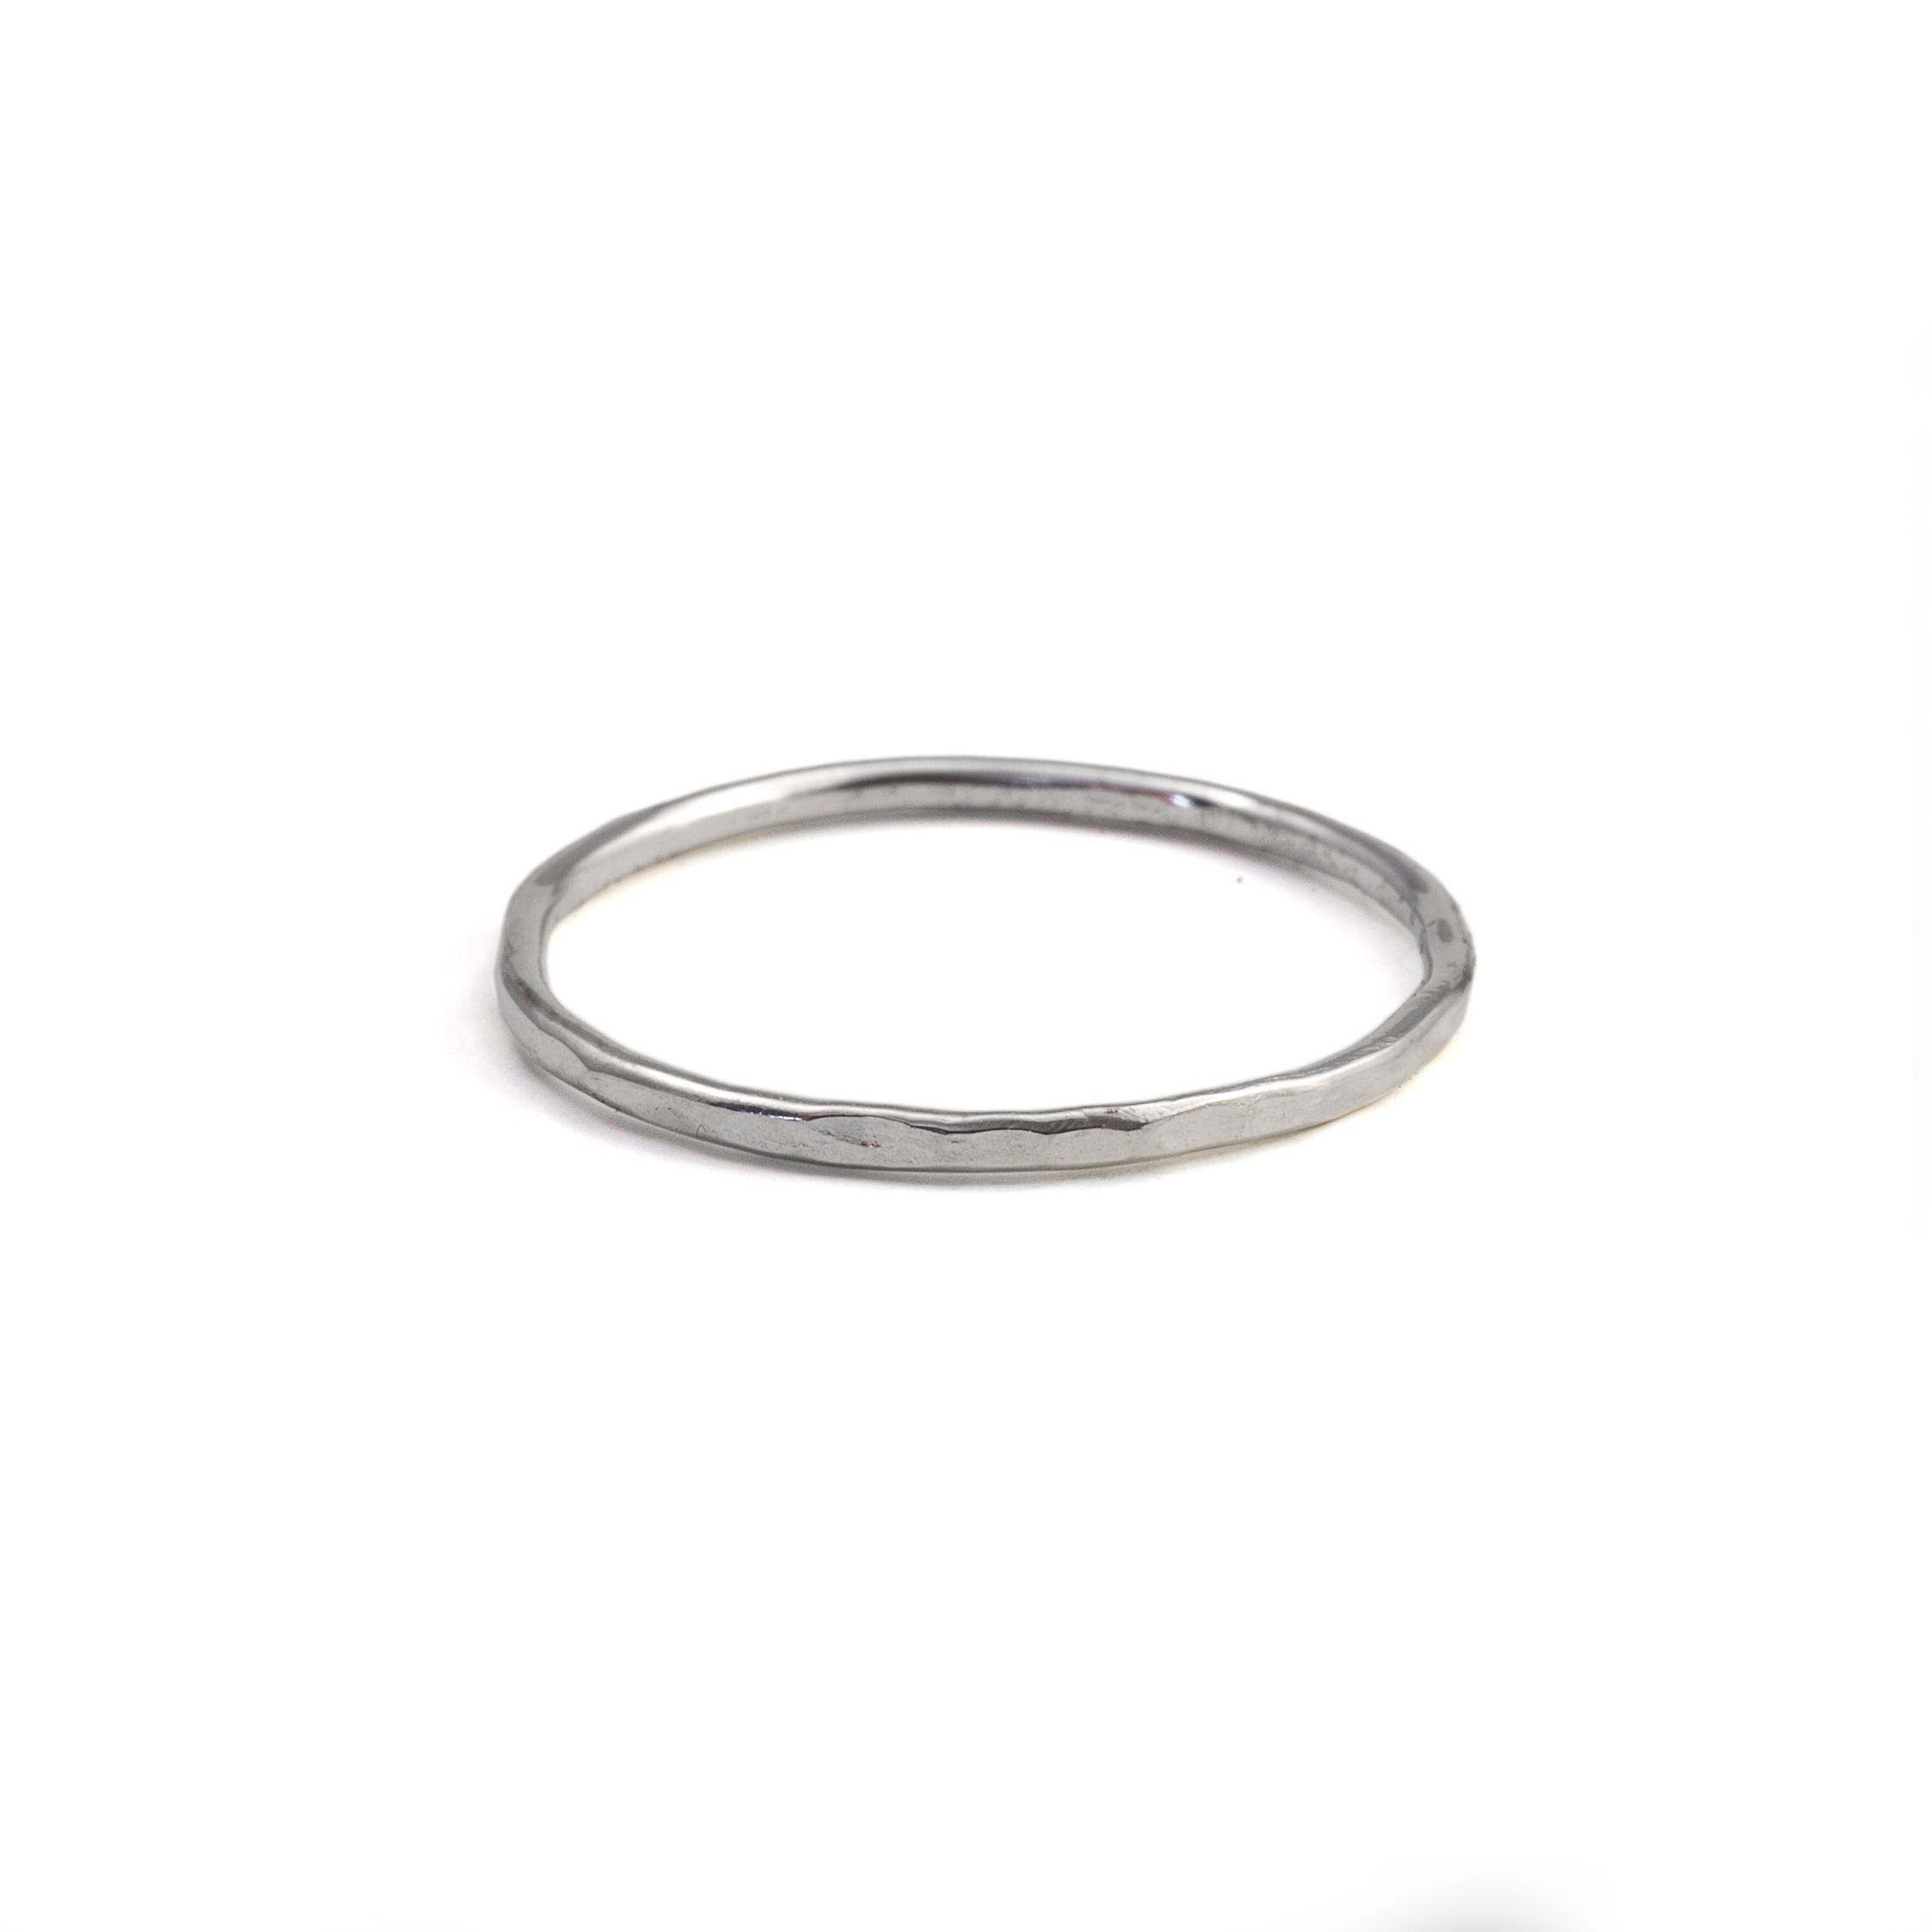 MNOP. Tunn ring.Återvunnet silver/ekosilver.